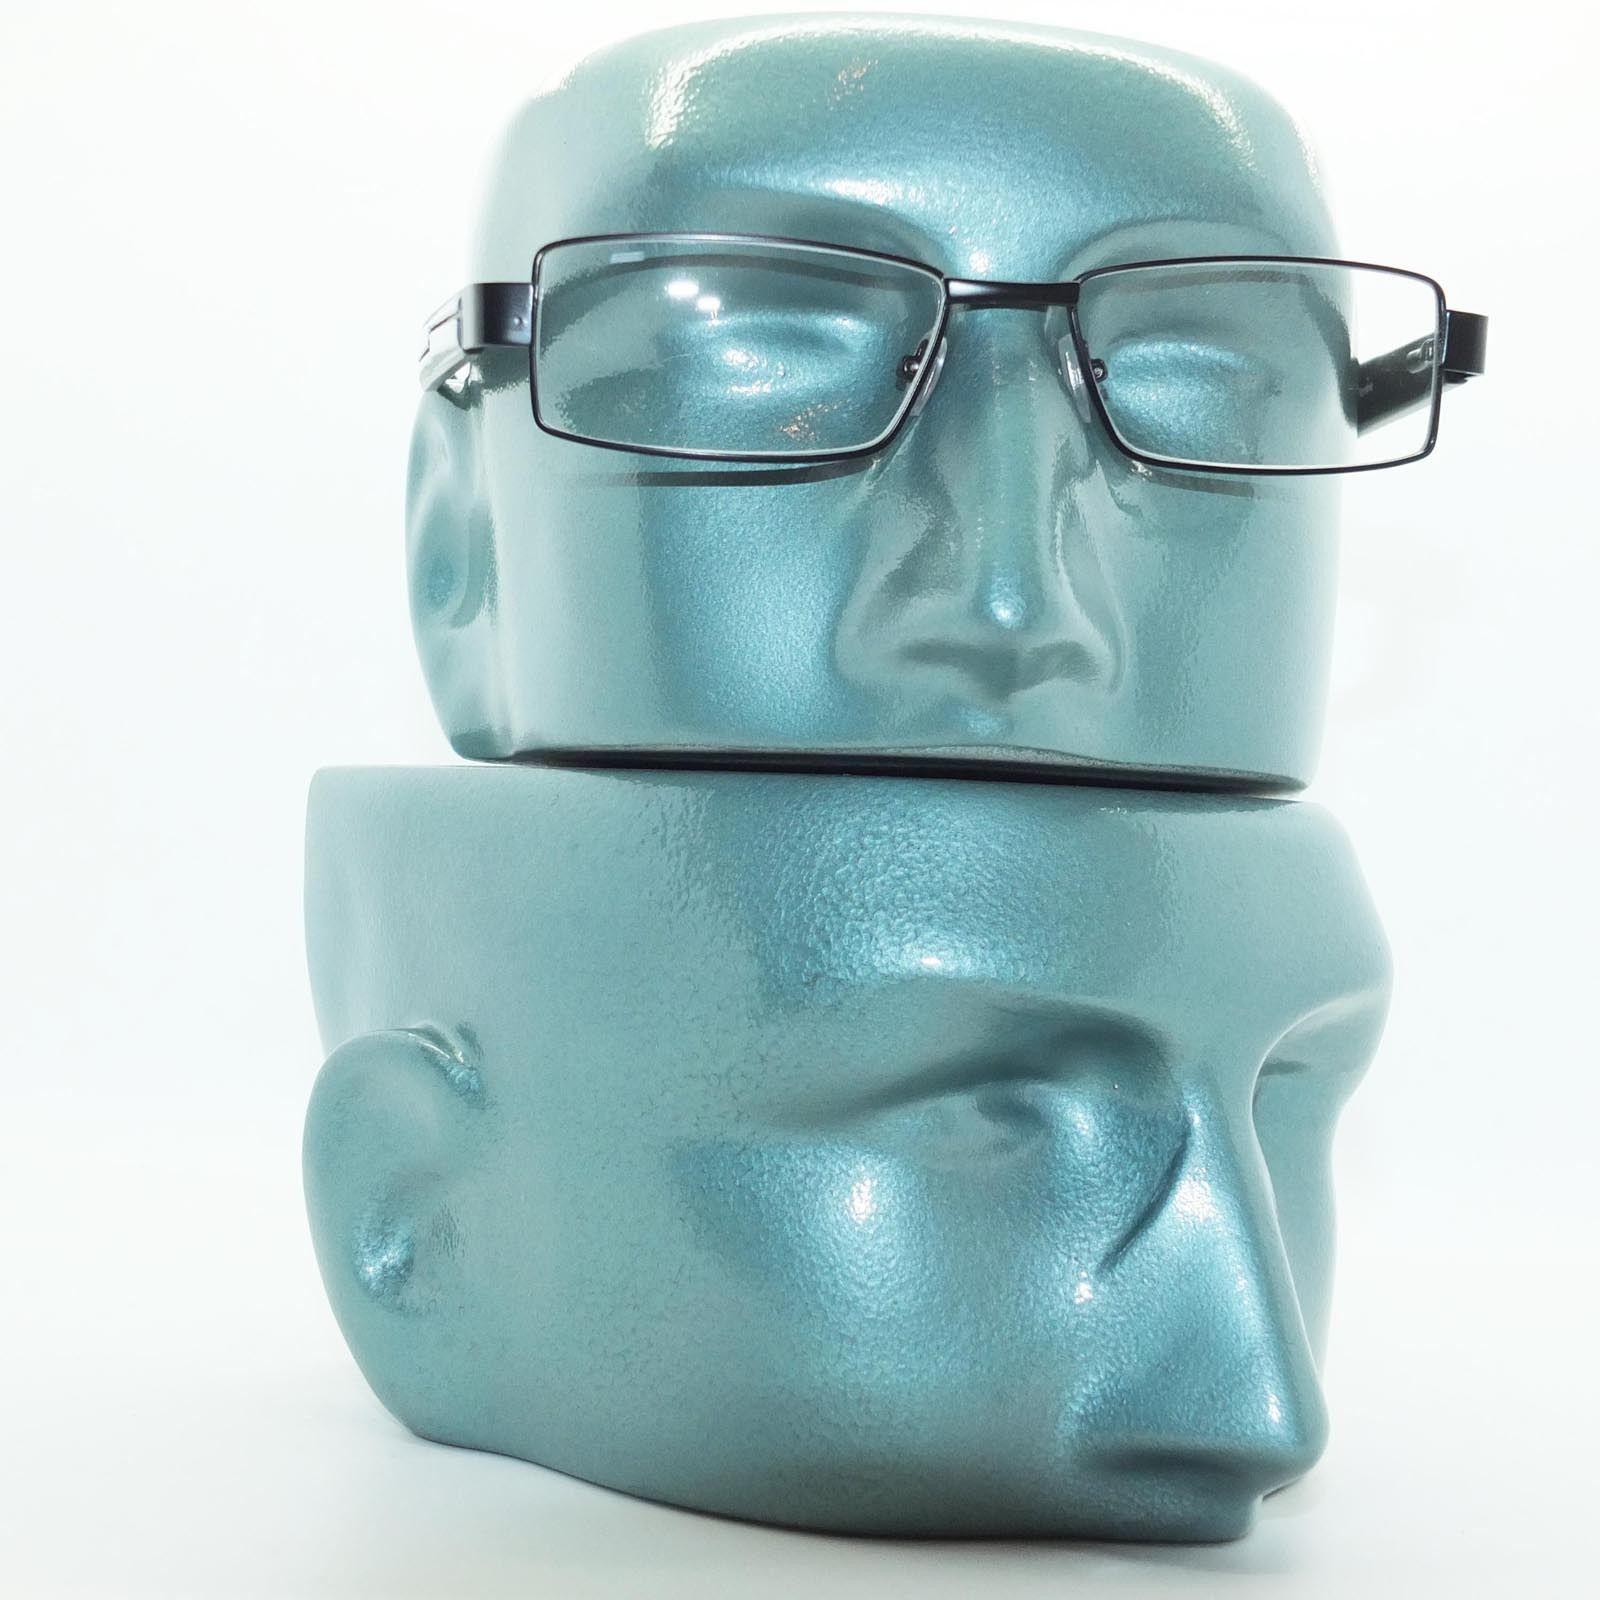 Reading Glasses Super Hi Tech Metro Metal Frame Jazz Black White Detail +4.00 image 3